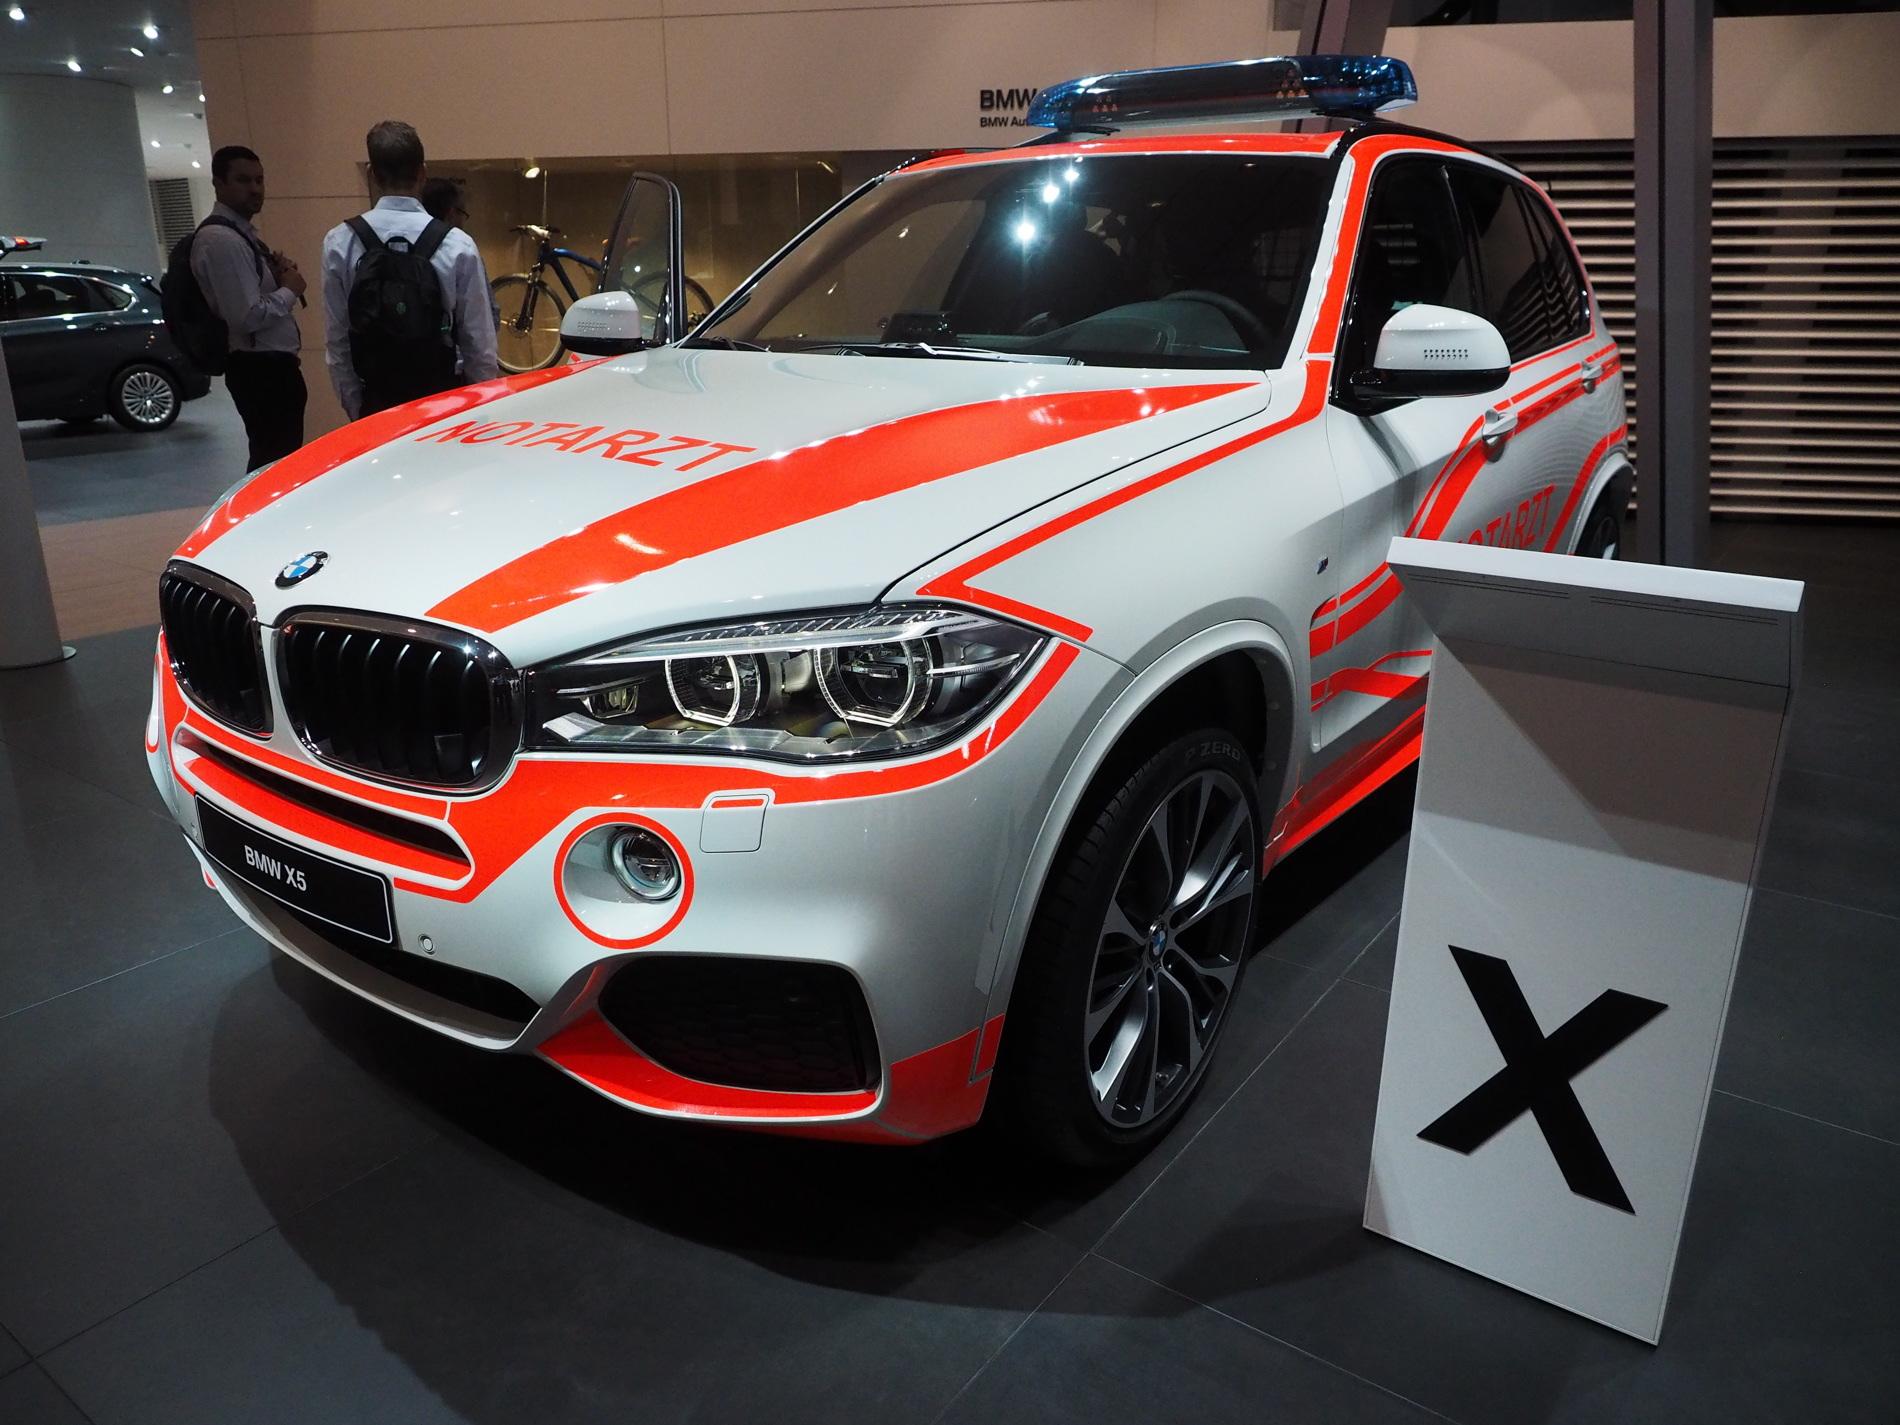 BMW X3 Emergency Vehicle images 01